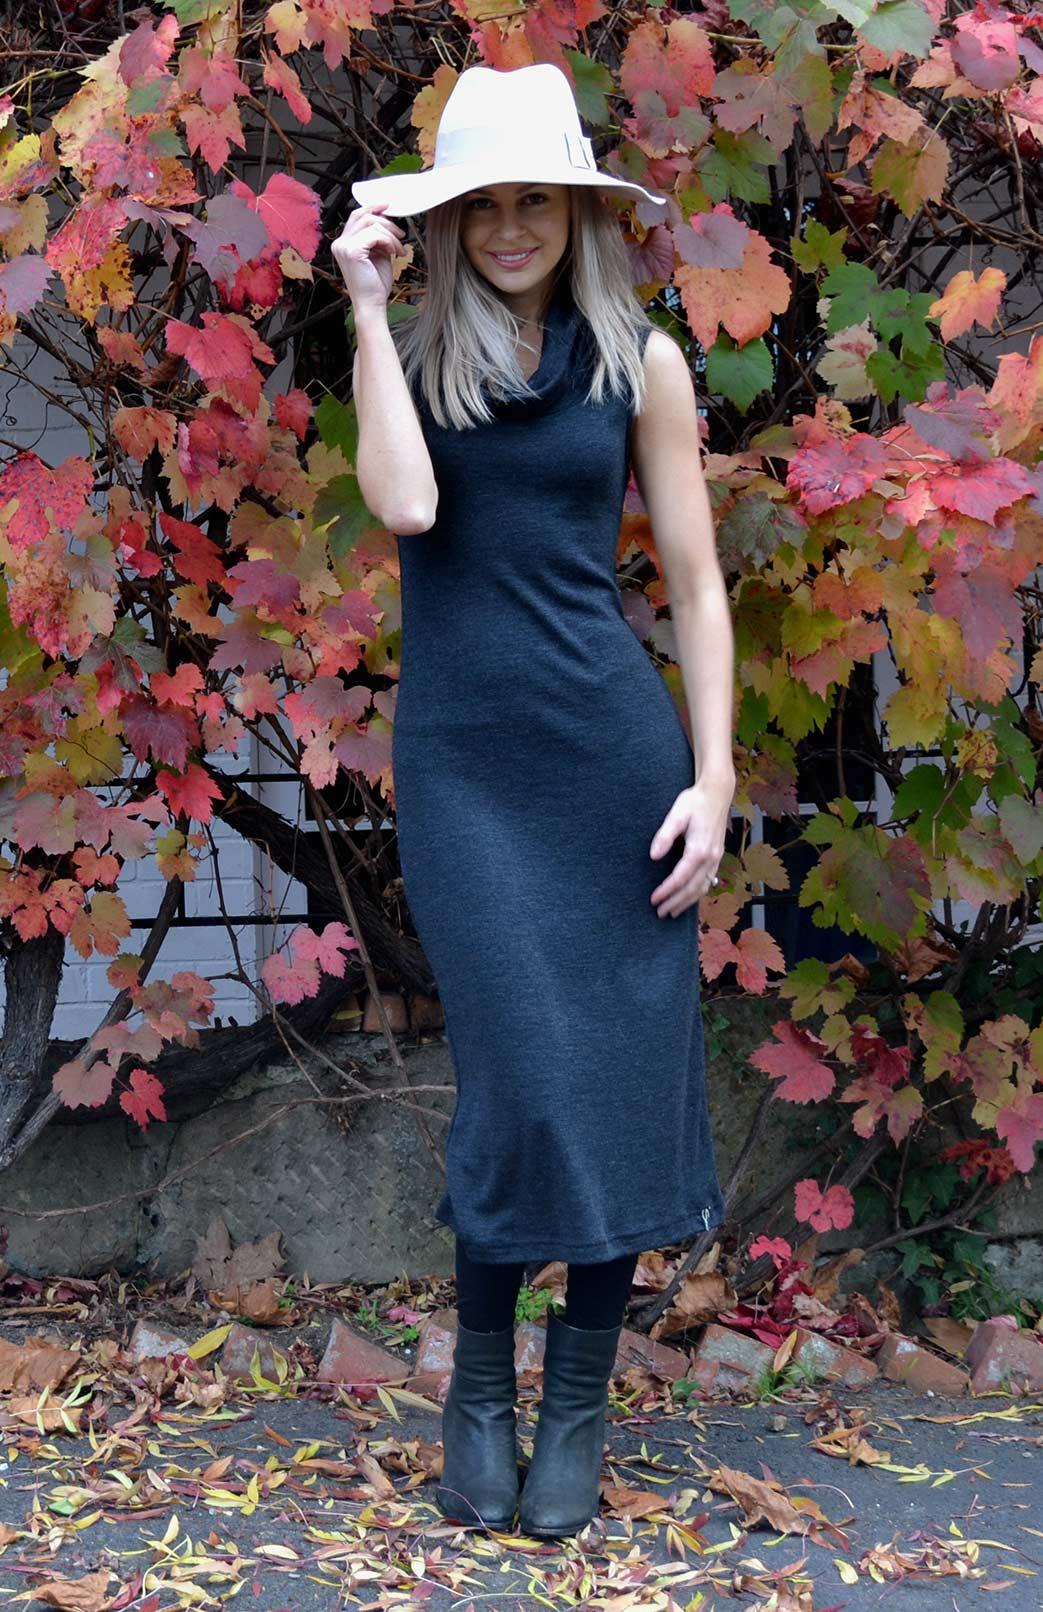 Sleeveless Cowl Dress - Women's Superfine Merino Wool Sleeveless Cowl Neck Dress - Smitten Merino Tasmania Australia